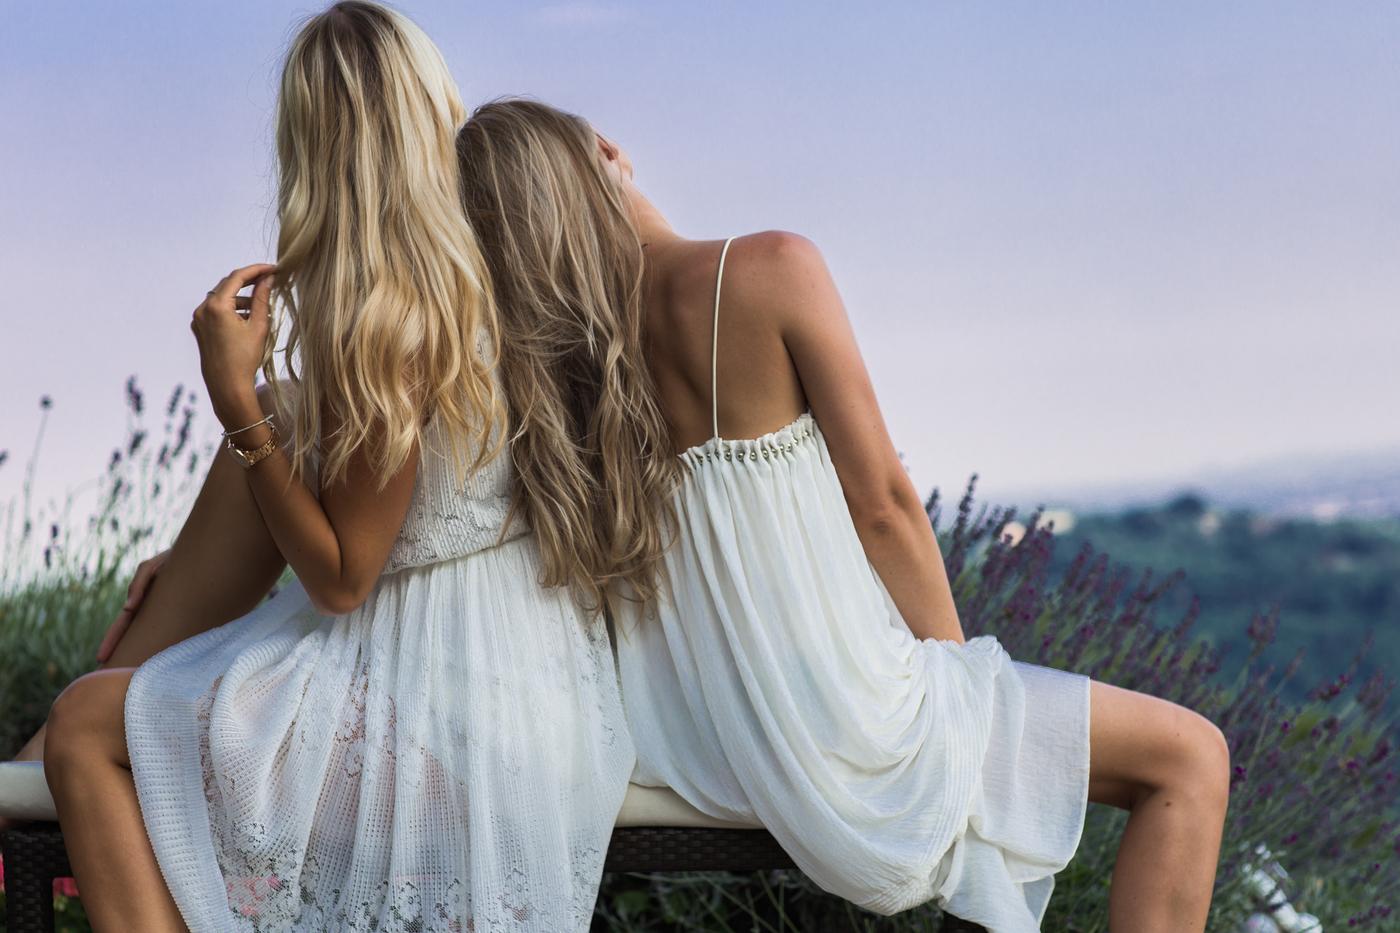 Mental Health Monday: Ystävyydestä